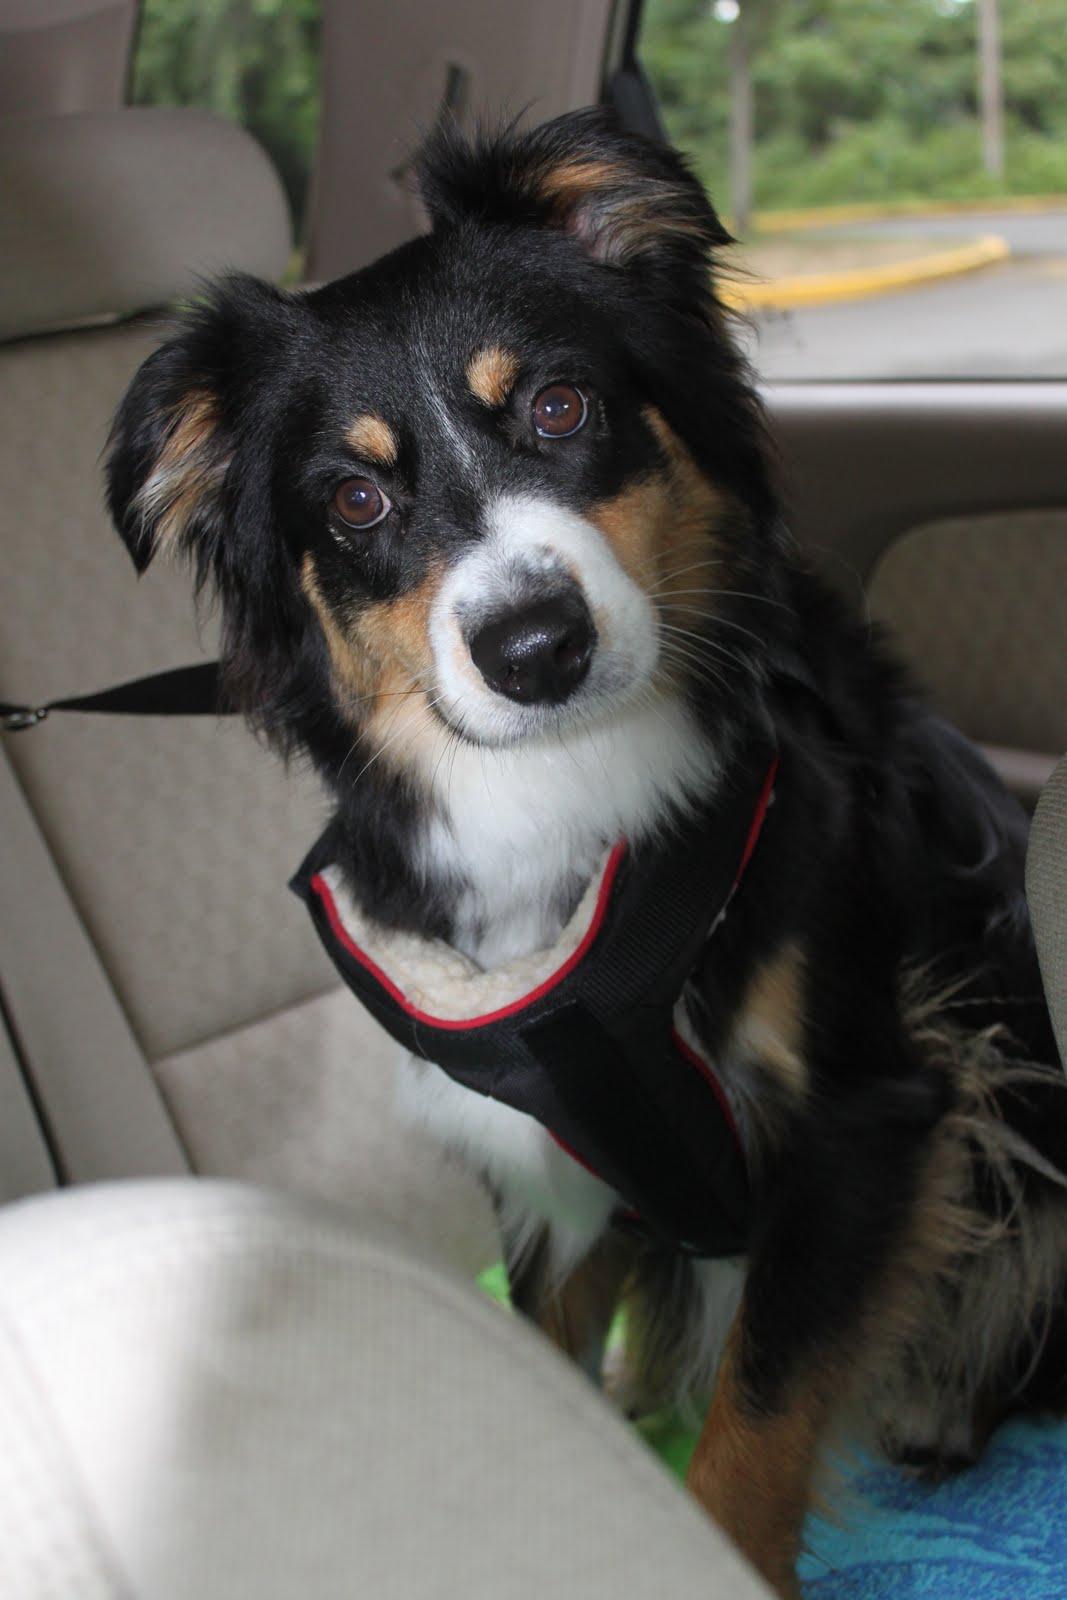 Miniature Australian Shepherd dog in the car wallpaper